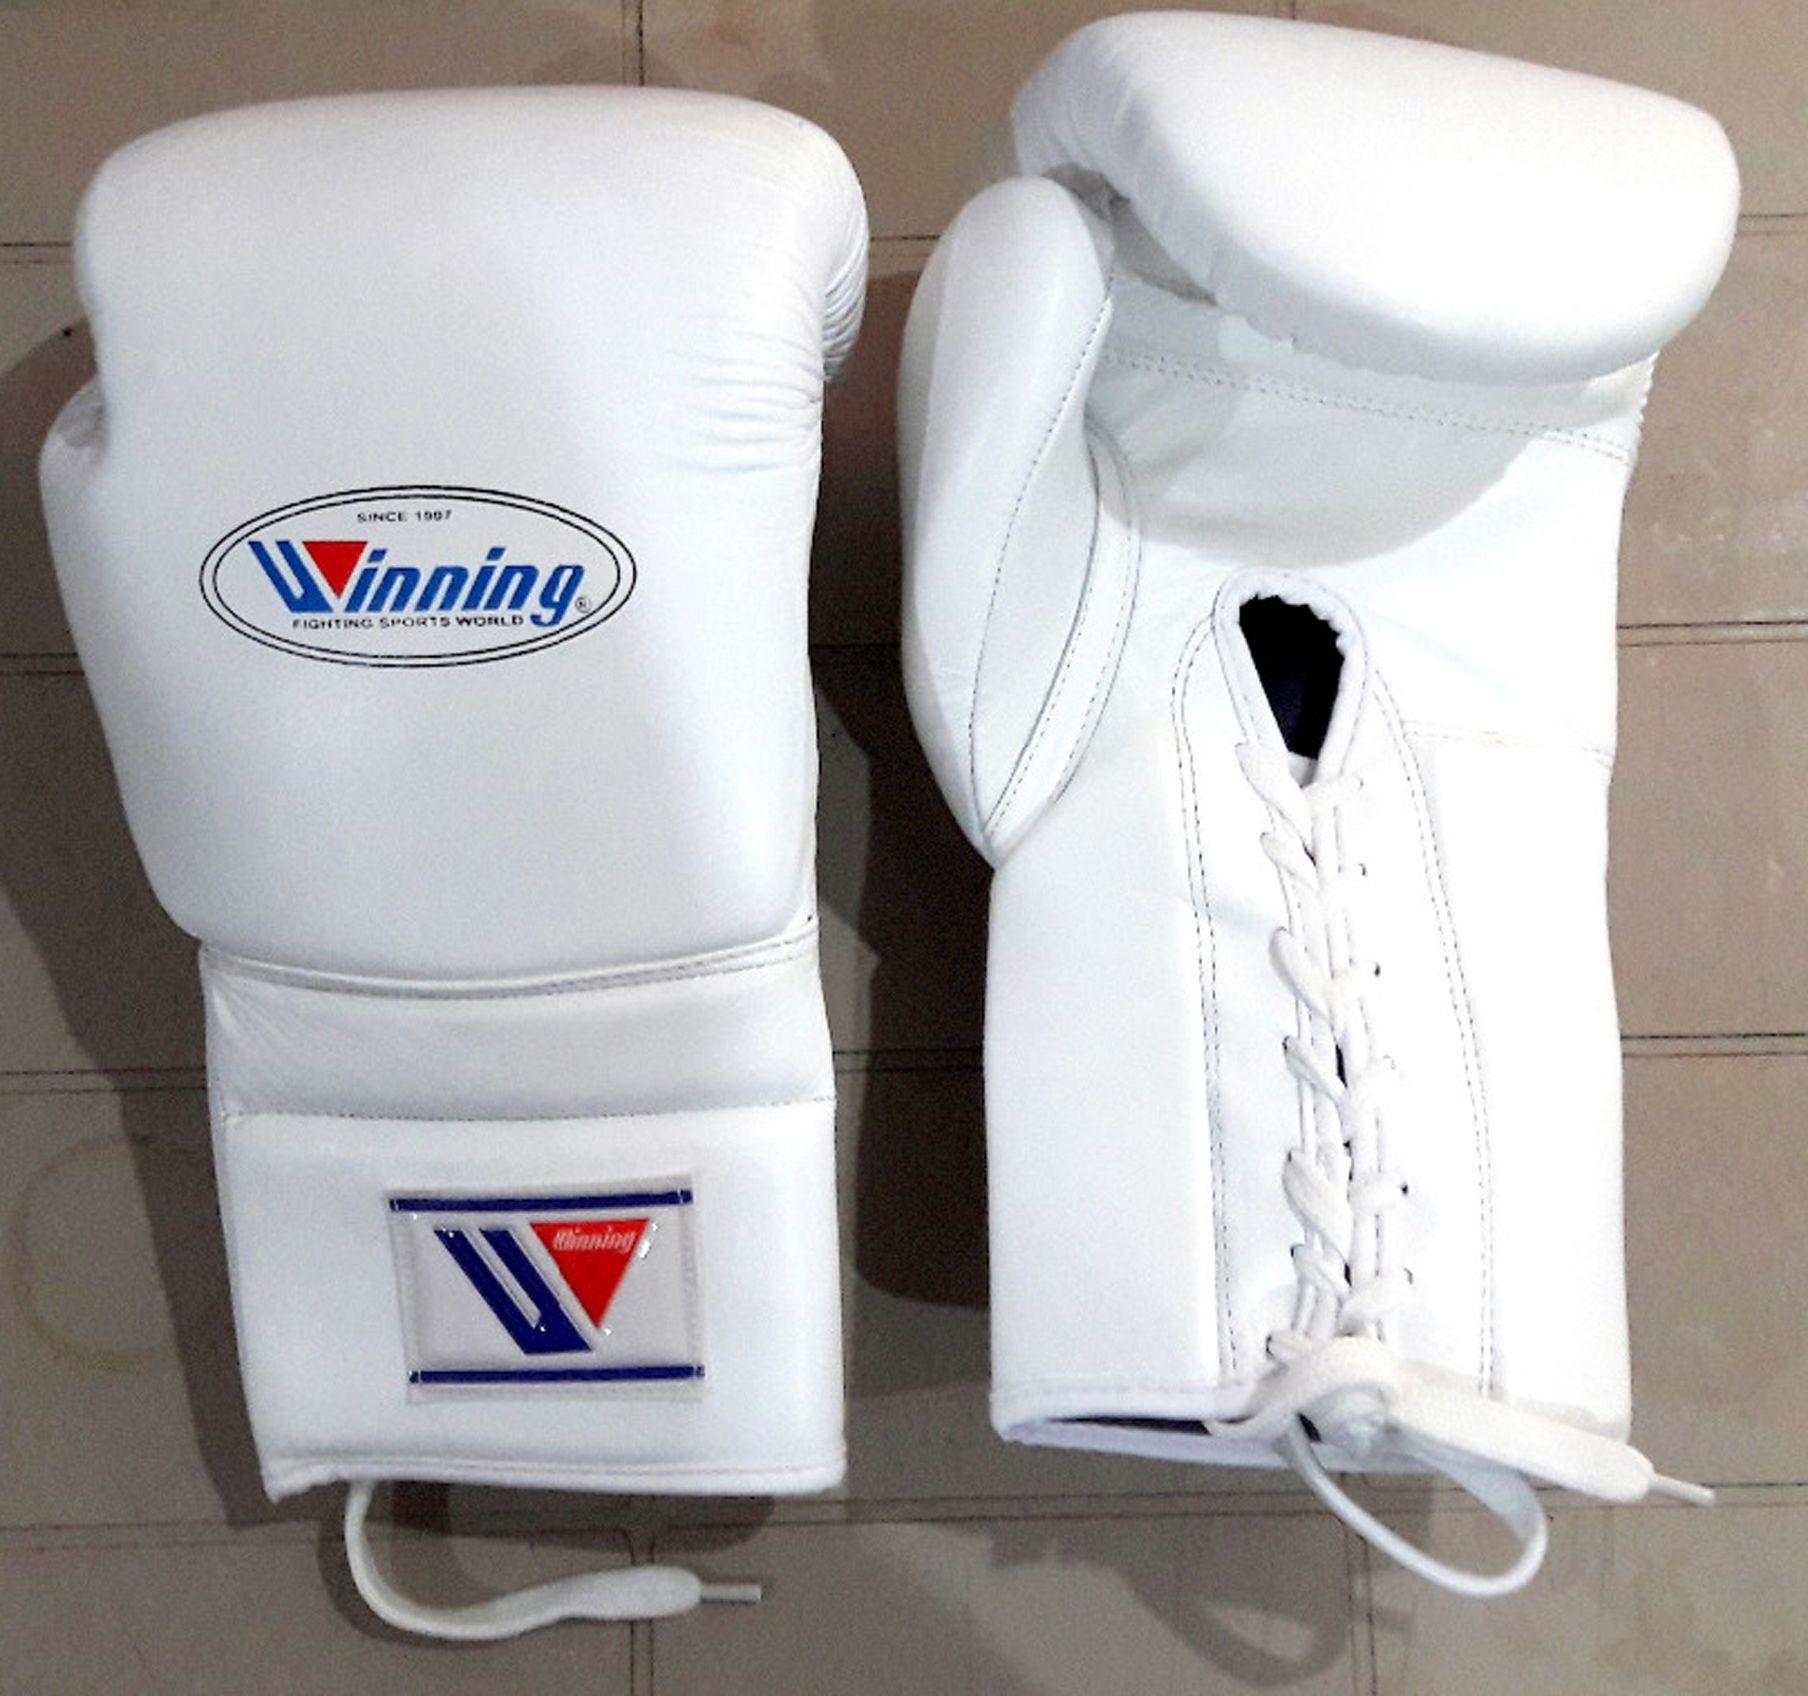 8d5c26be0 Winning boxing gloves white 100 US  free Shipping.  Boxing  boxing glove   winning boxing glove  grant boxing glove   cleto boxing glove  venum Boxing  gloves ...